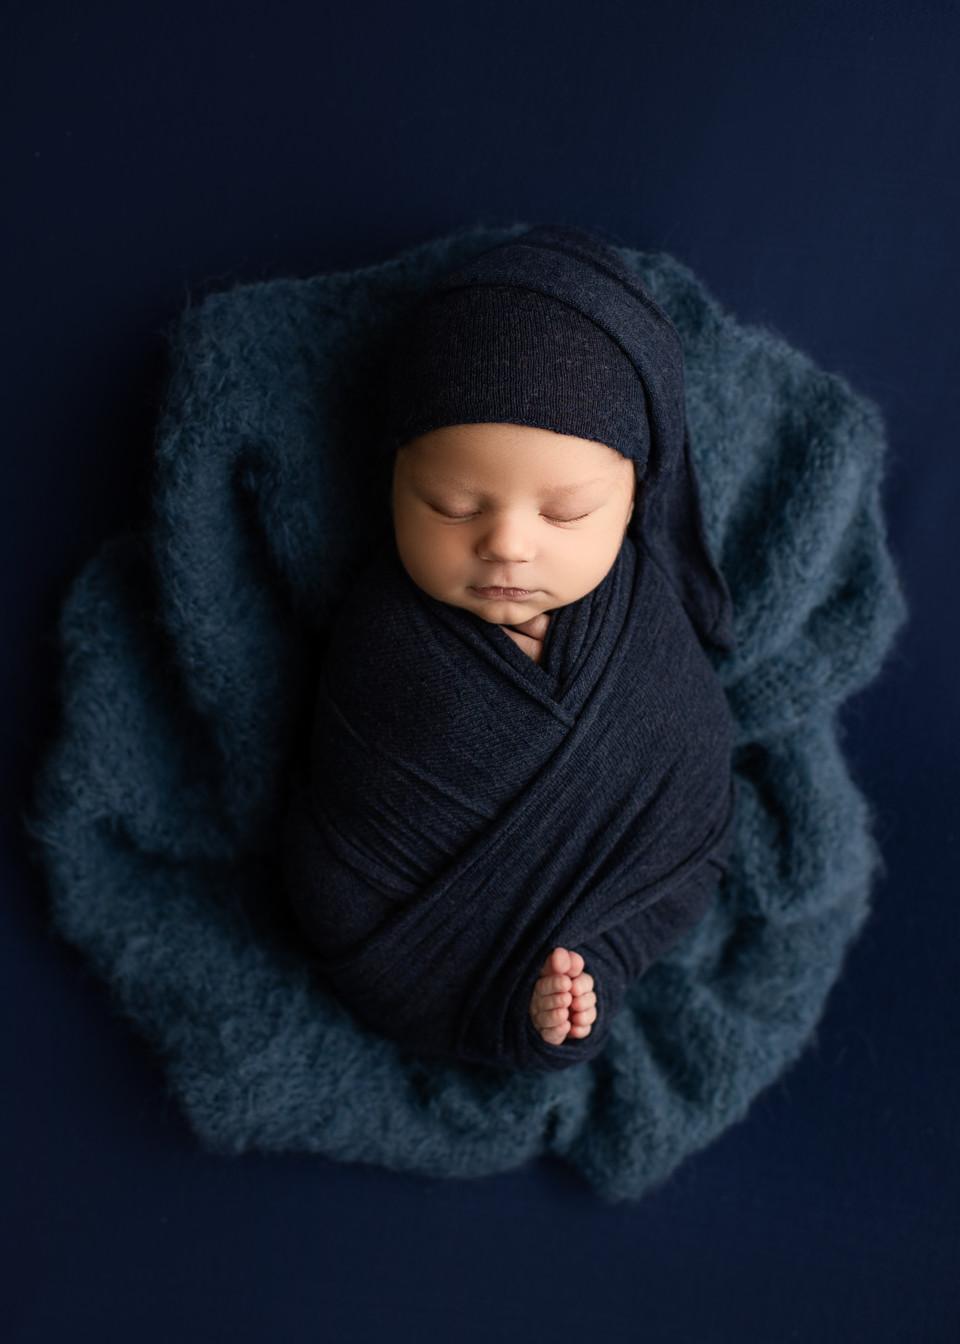 newborn, baby photos, photographer, photography, regina, balgonie, studio